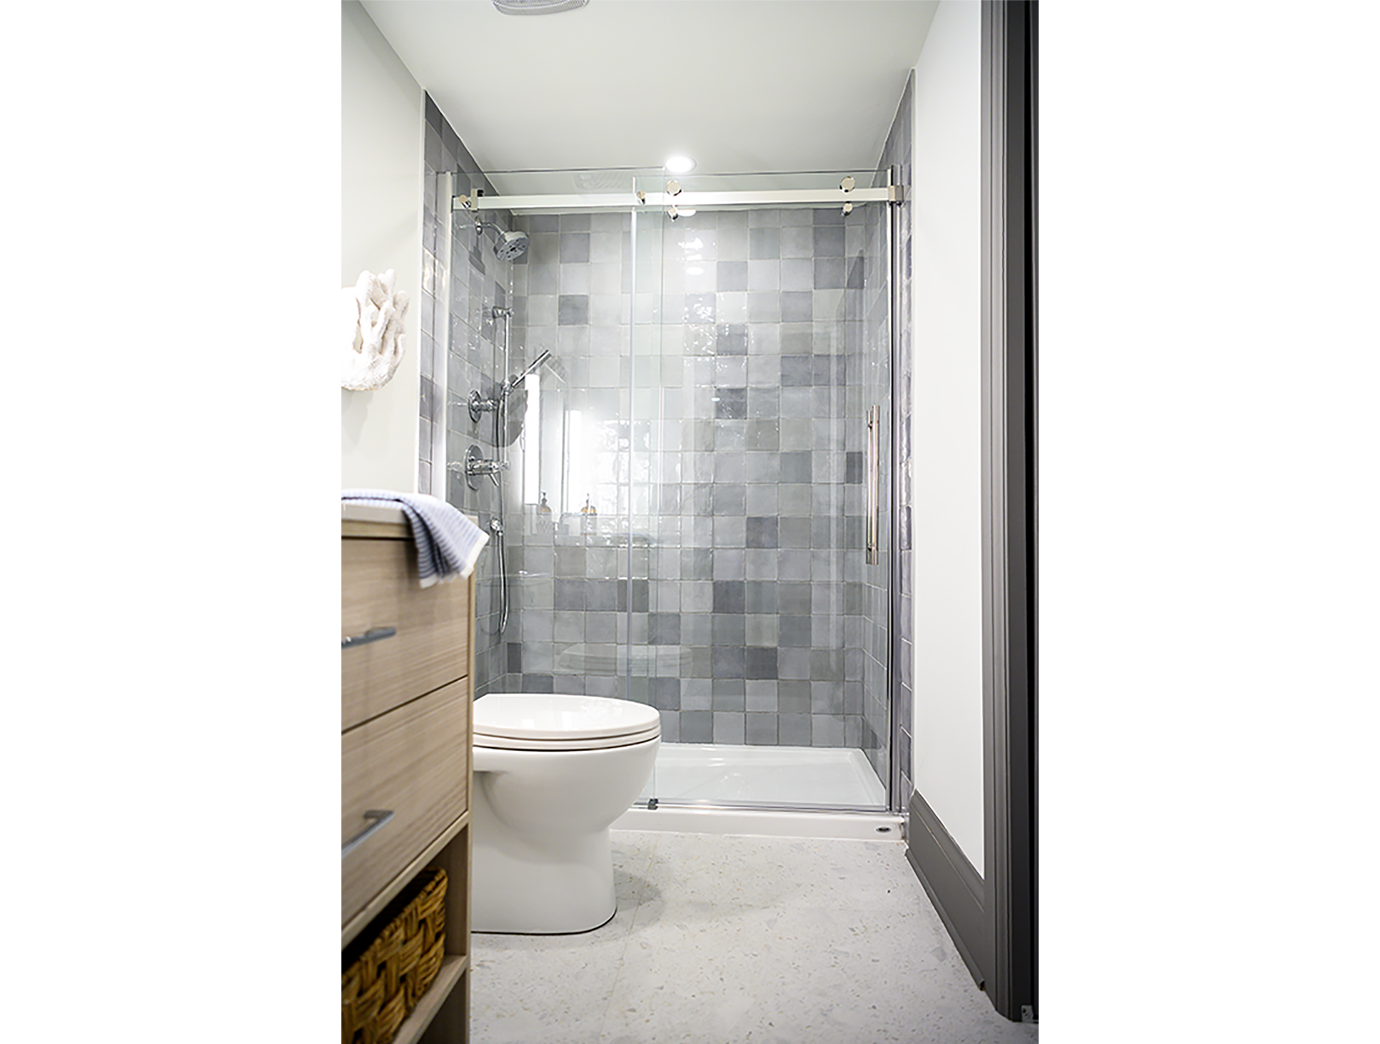 euro-tile-stone-cheo-dream-home-gawley-aritsan-bathroom